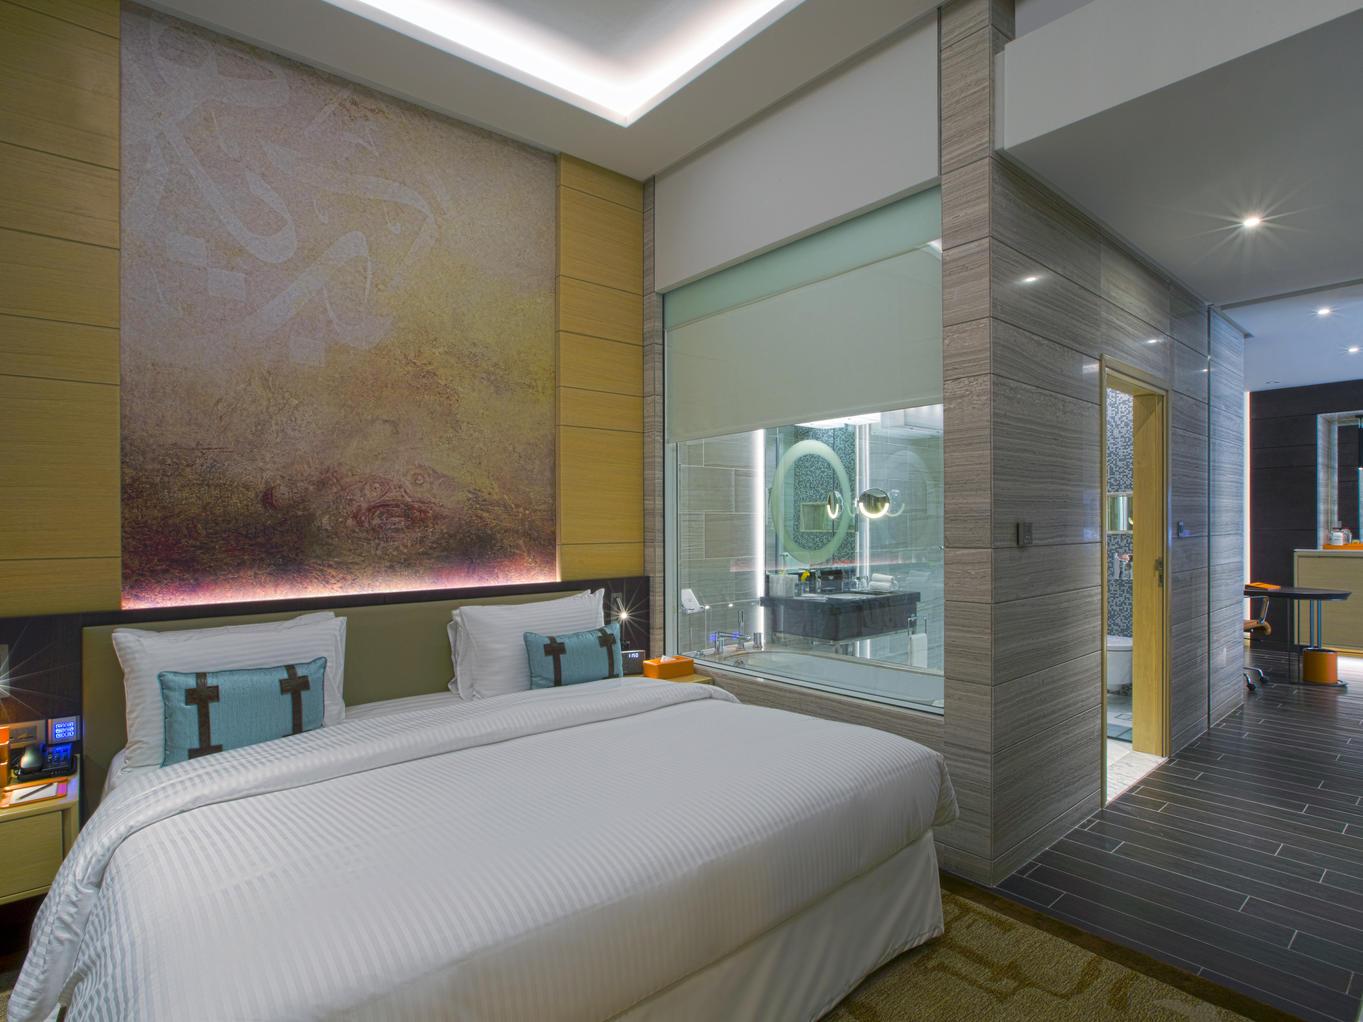 Signature Room at Grayton Hotel Dubai